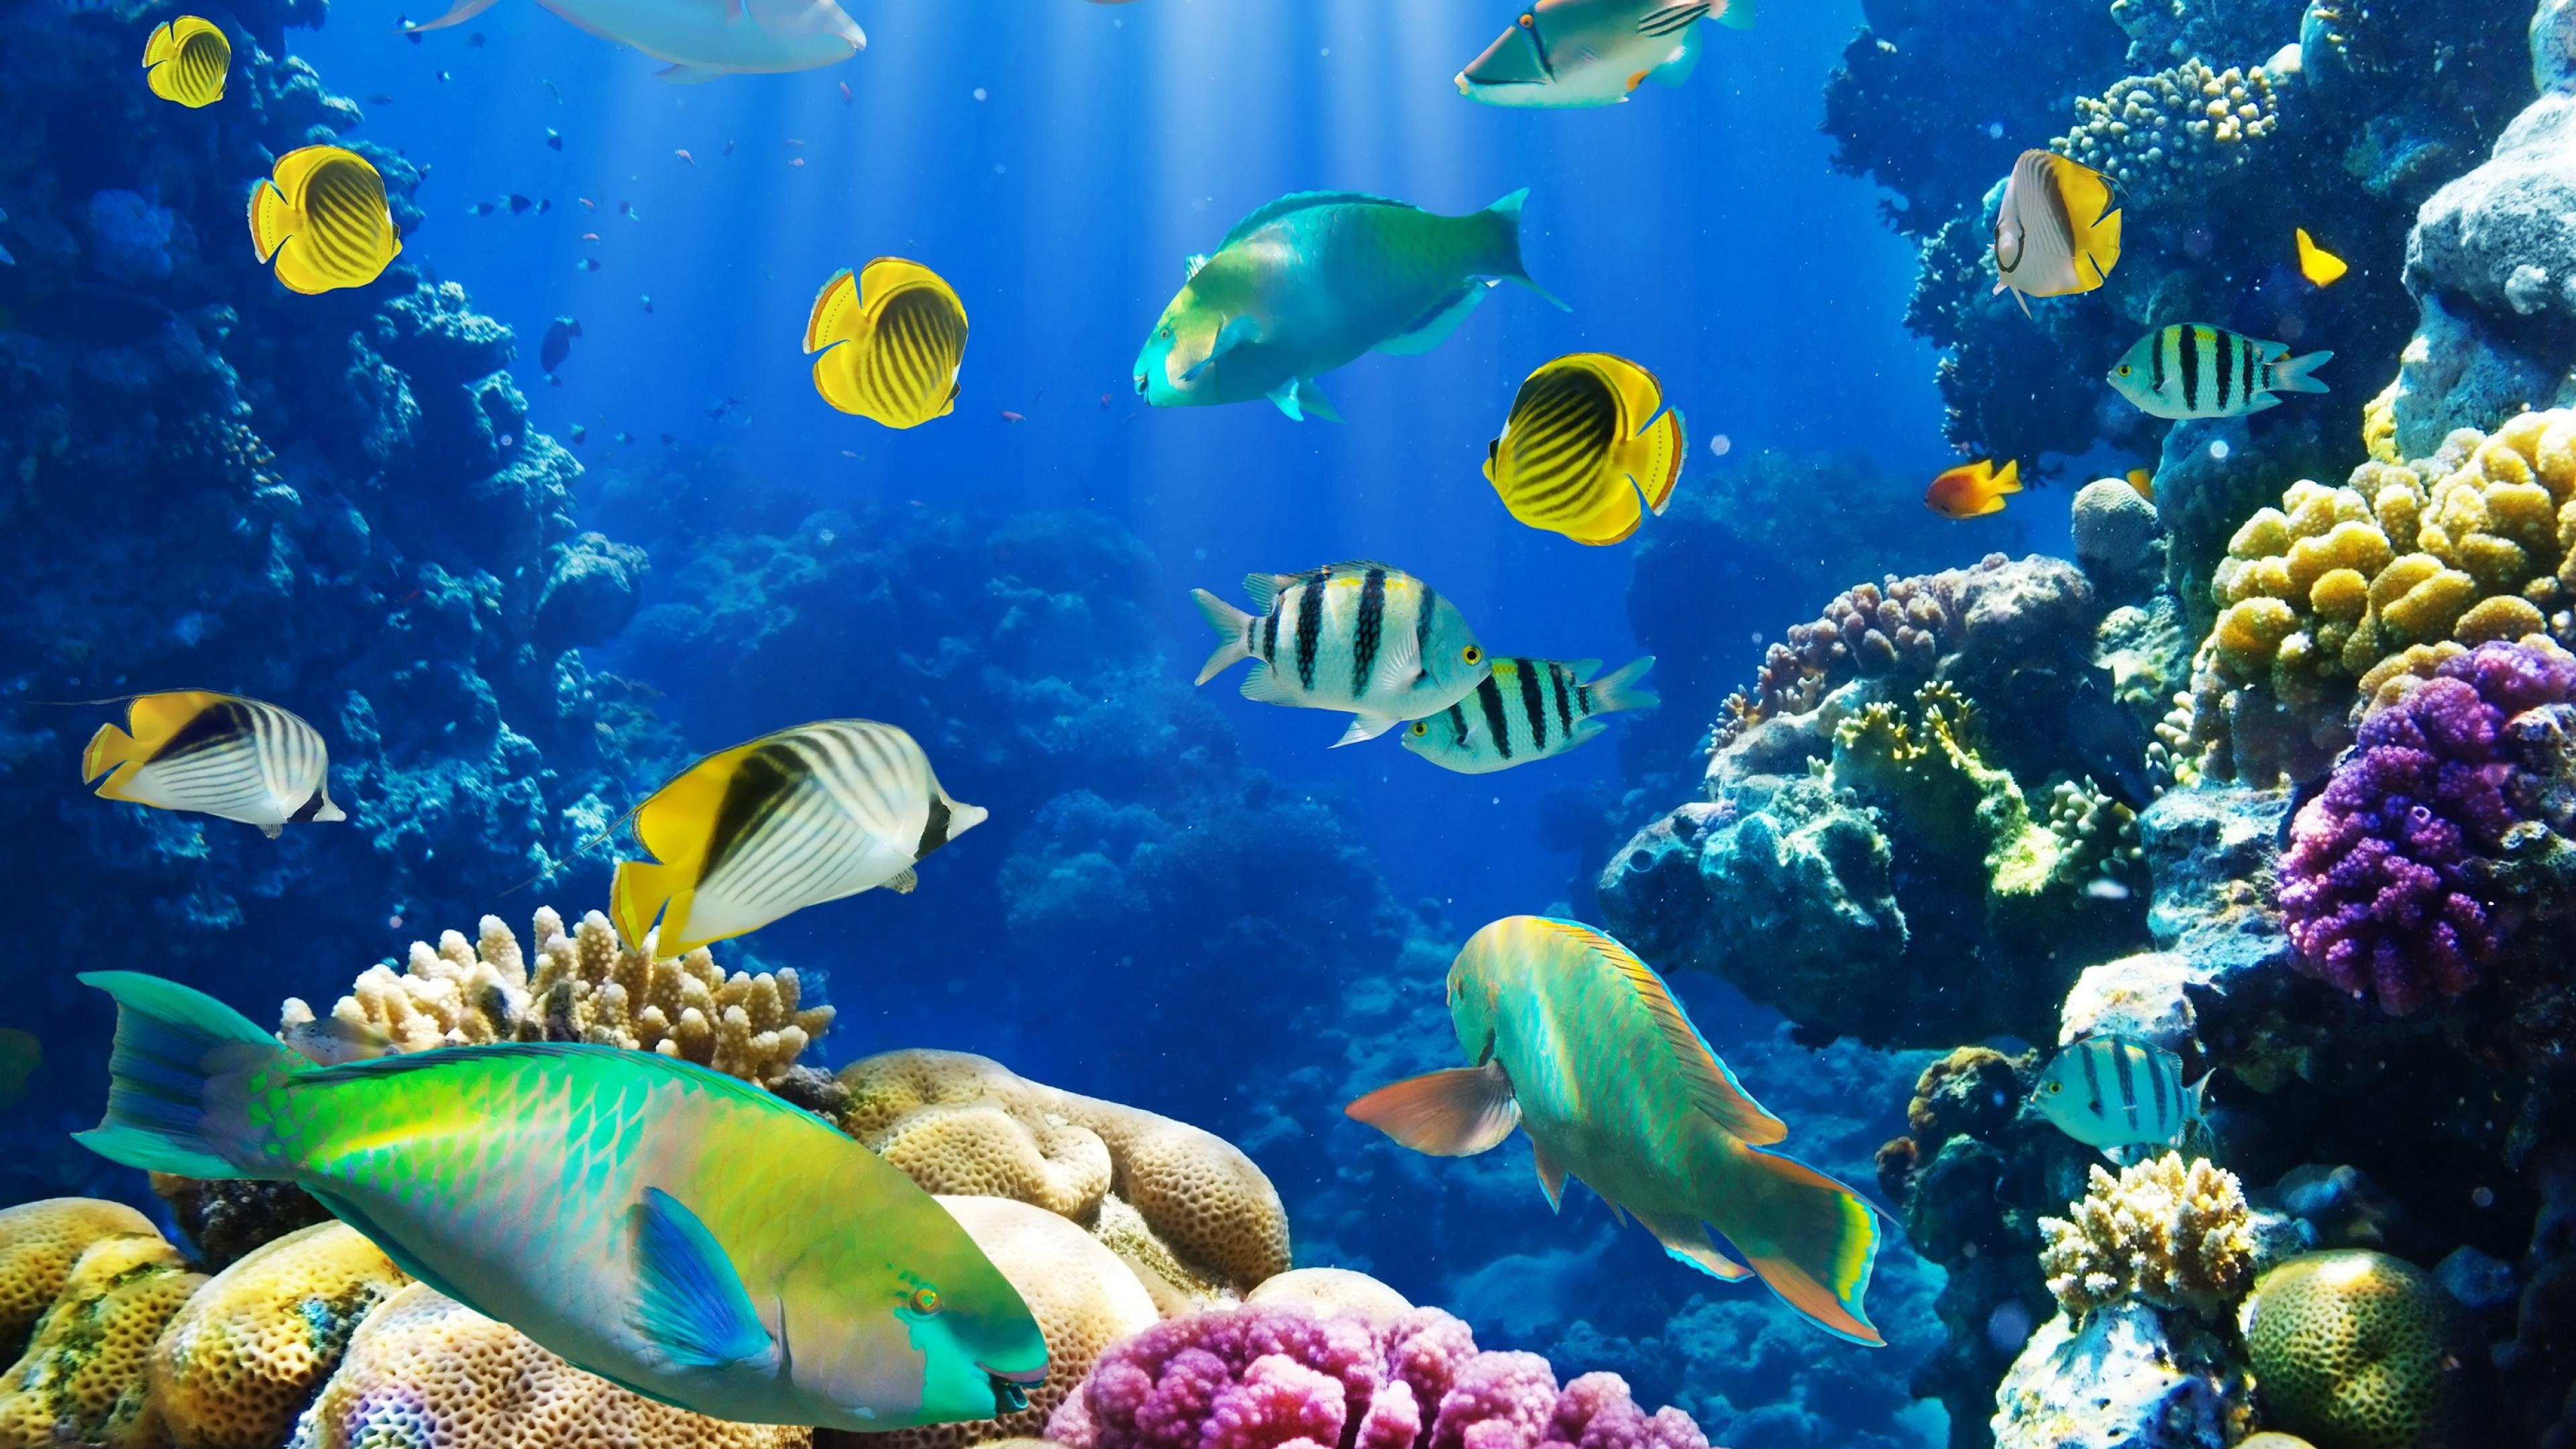 Underwater fish fishes tropical ocean sea reef fauna pinterest tropical coral reef underwater ocean fishes underwater world coral publicscrutiny Images